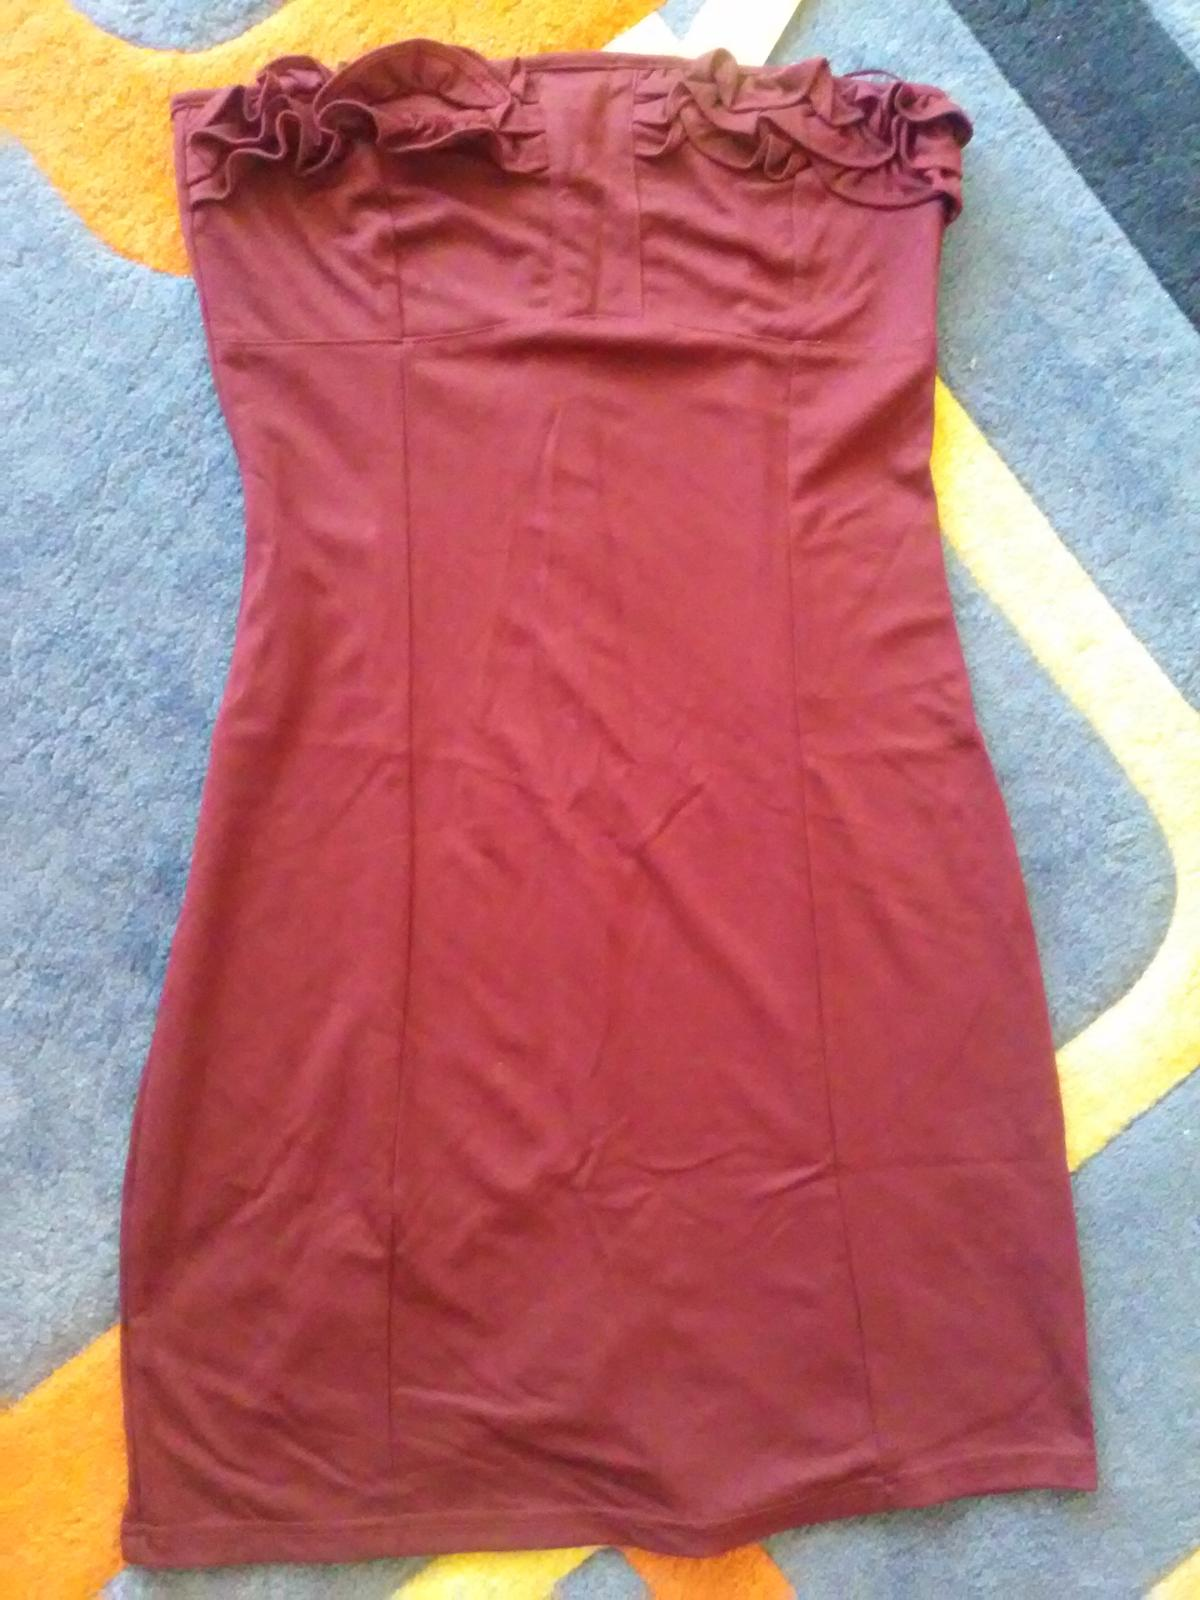 Bordové nenosené šaty - Obrázok č. 1